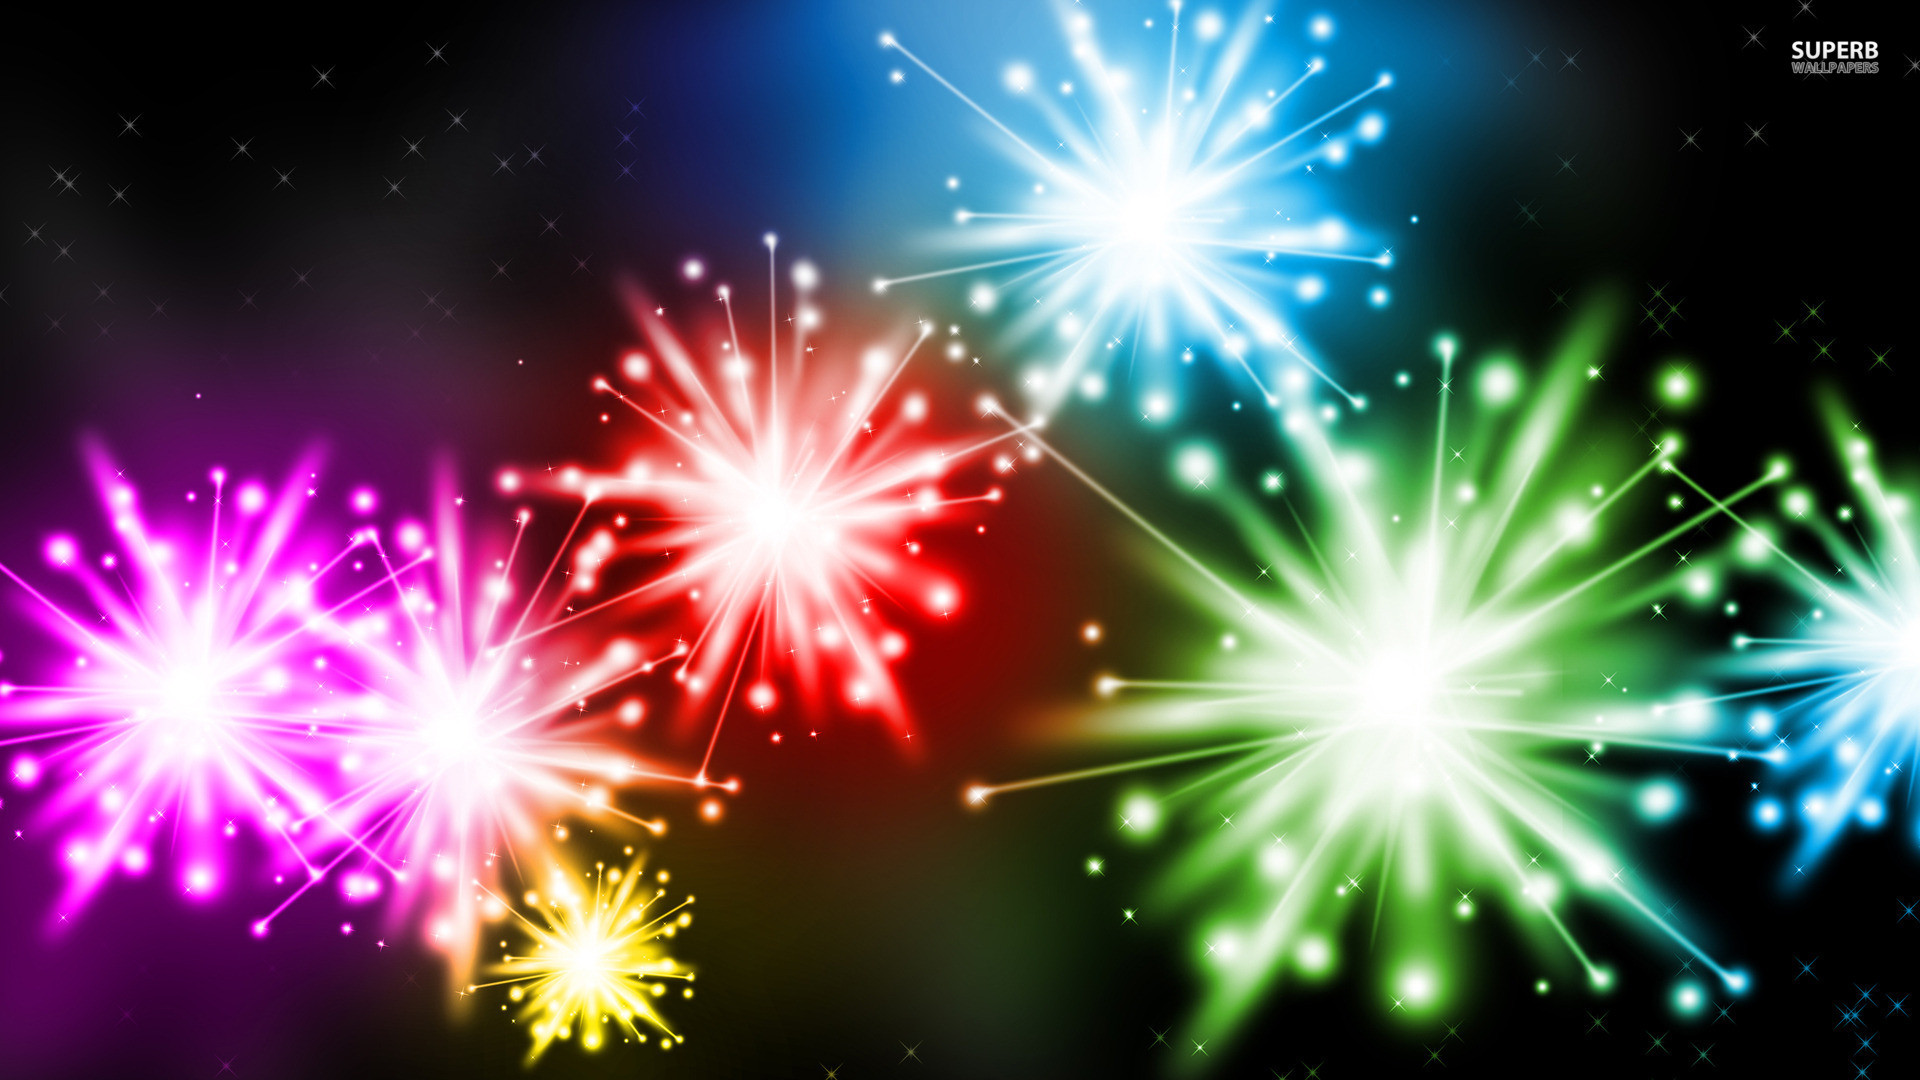 Fireworks Wallpaper Free: Fireworks Background